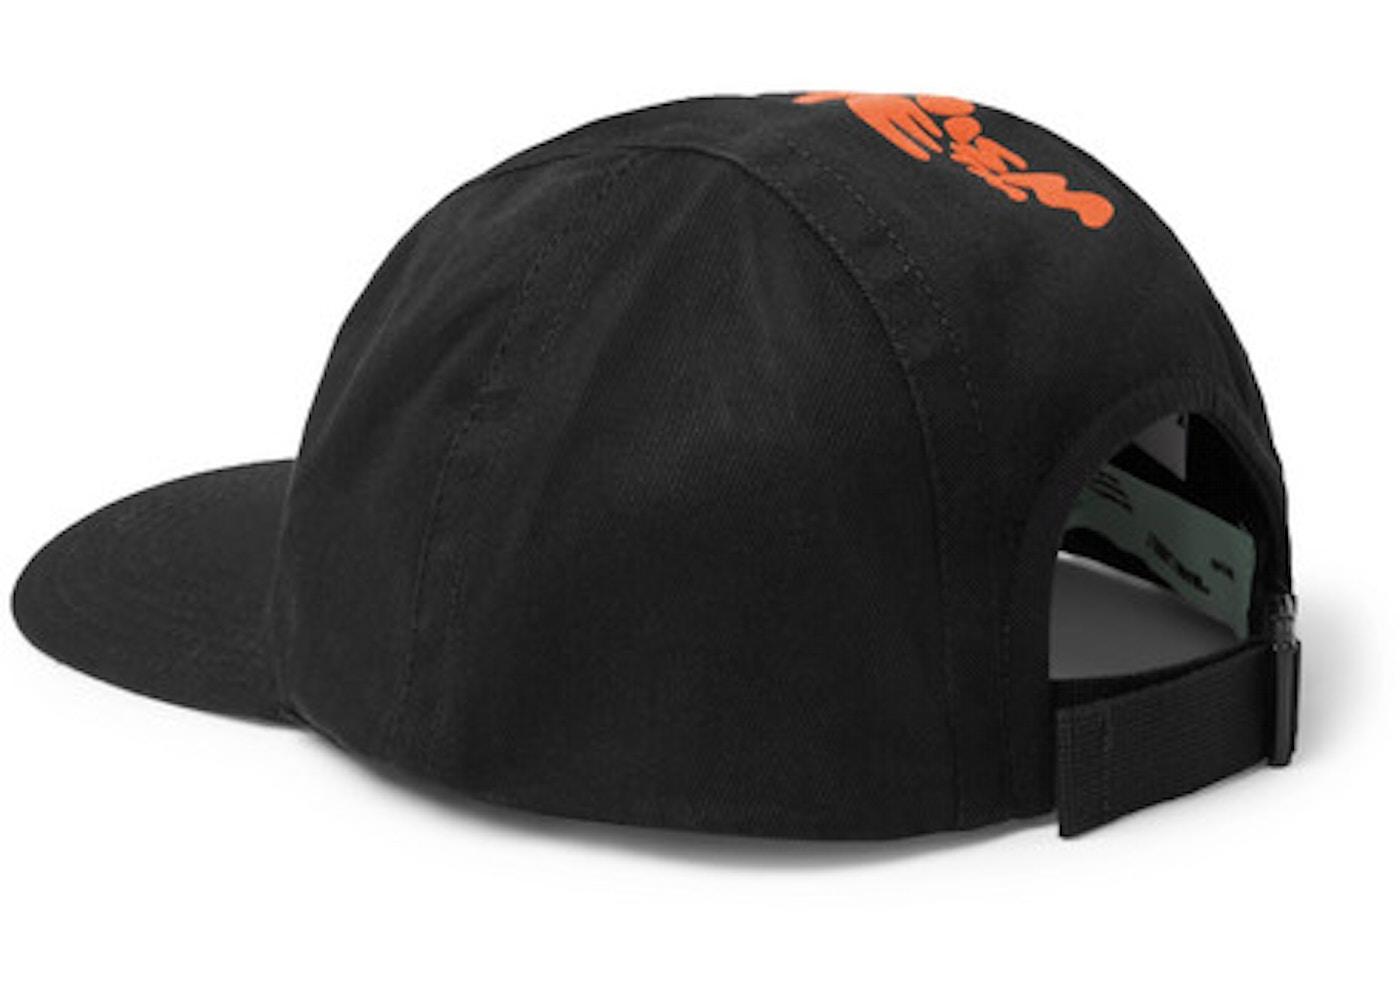 521cbc10 OFF-WHITE Logo Print Baseball Hat Black/Orange - SS19